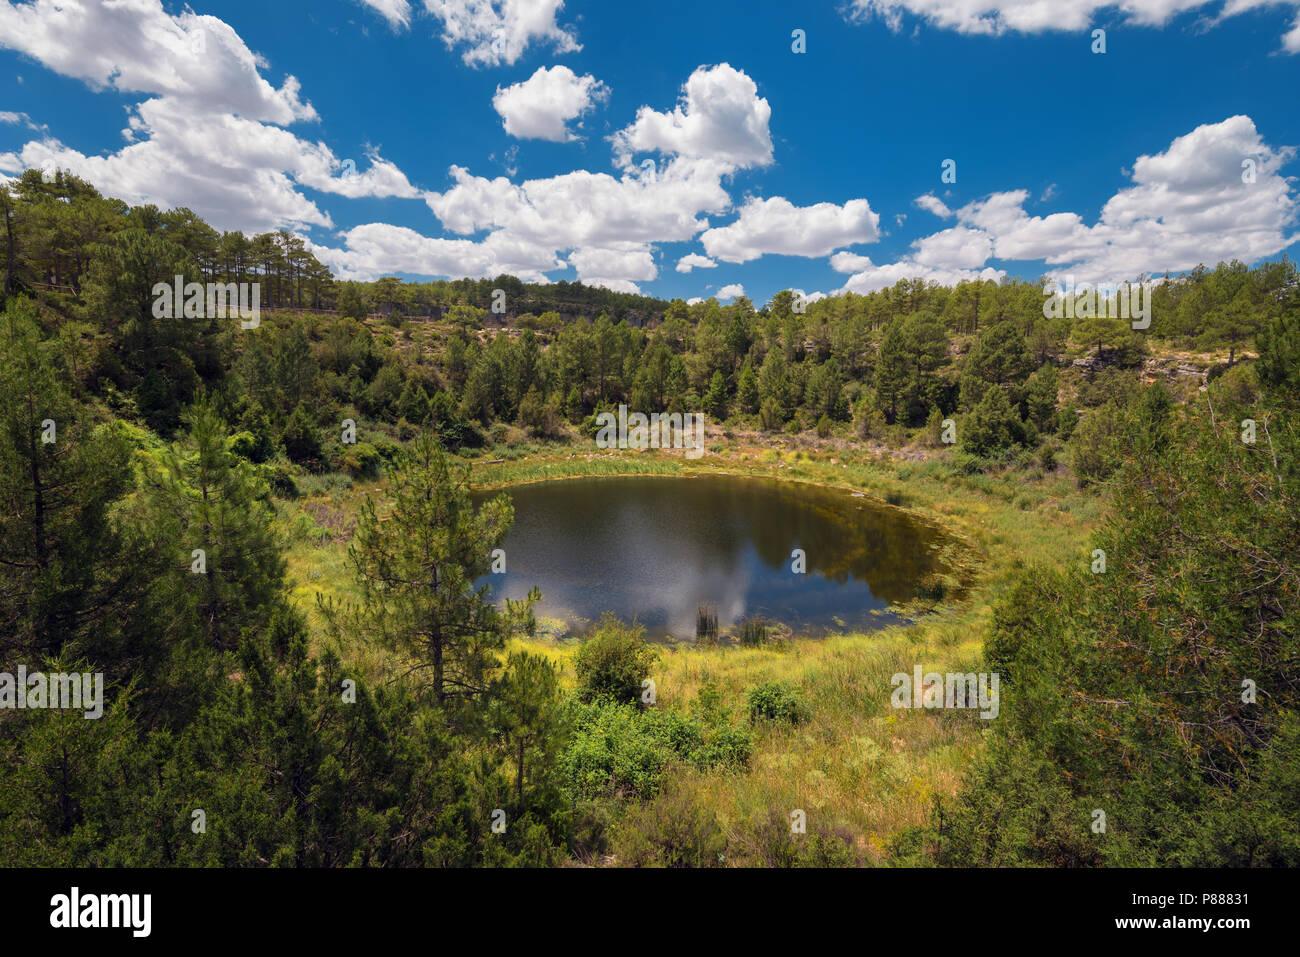 Round lake geologic formation in Cuenca province, Castilla La Mancha, Spain. Stock Photo